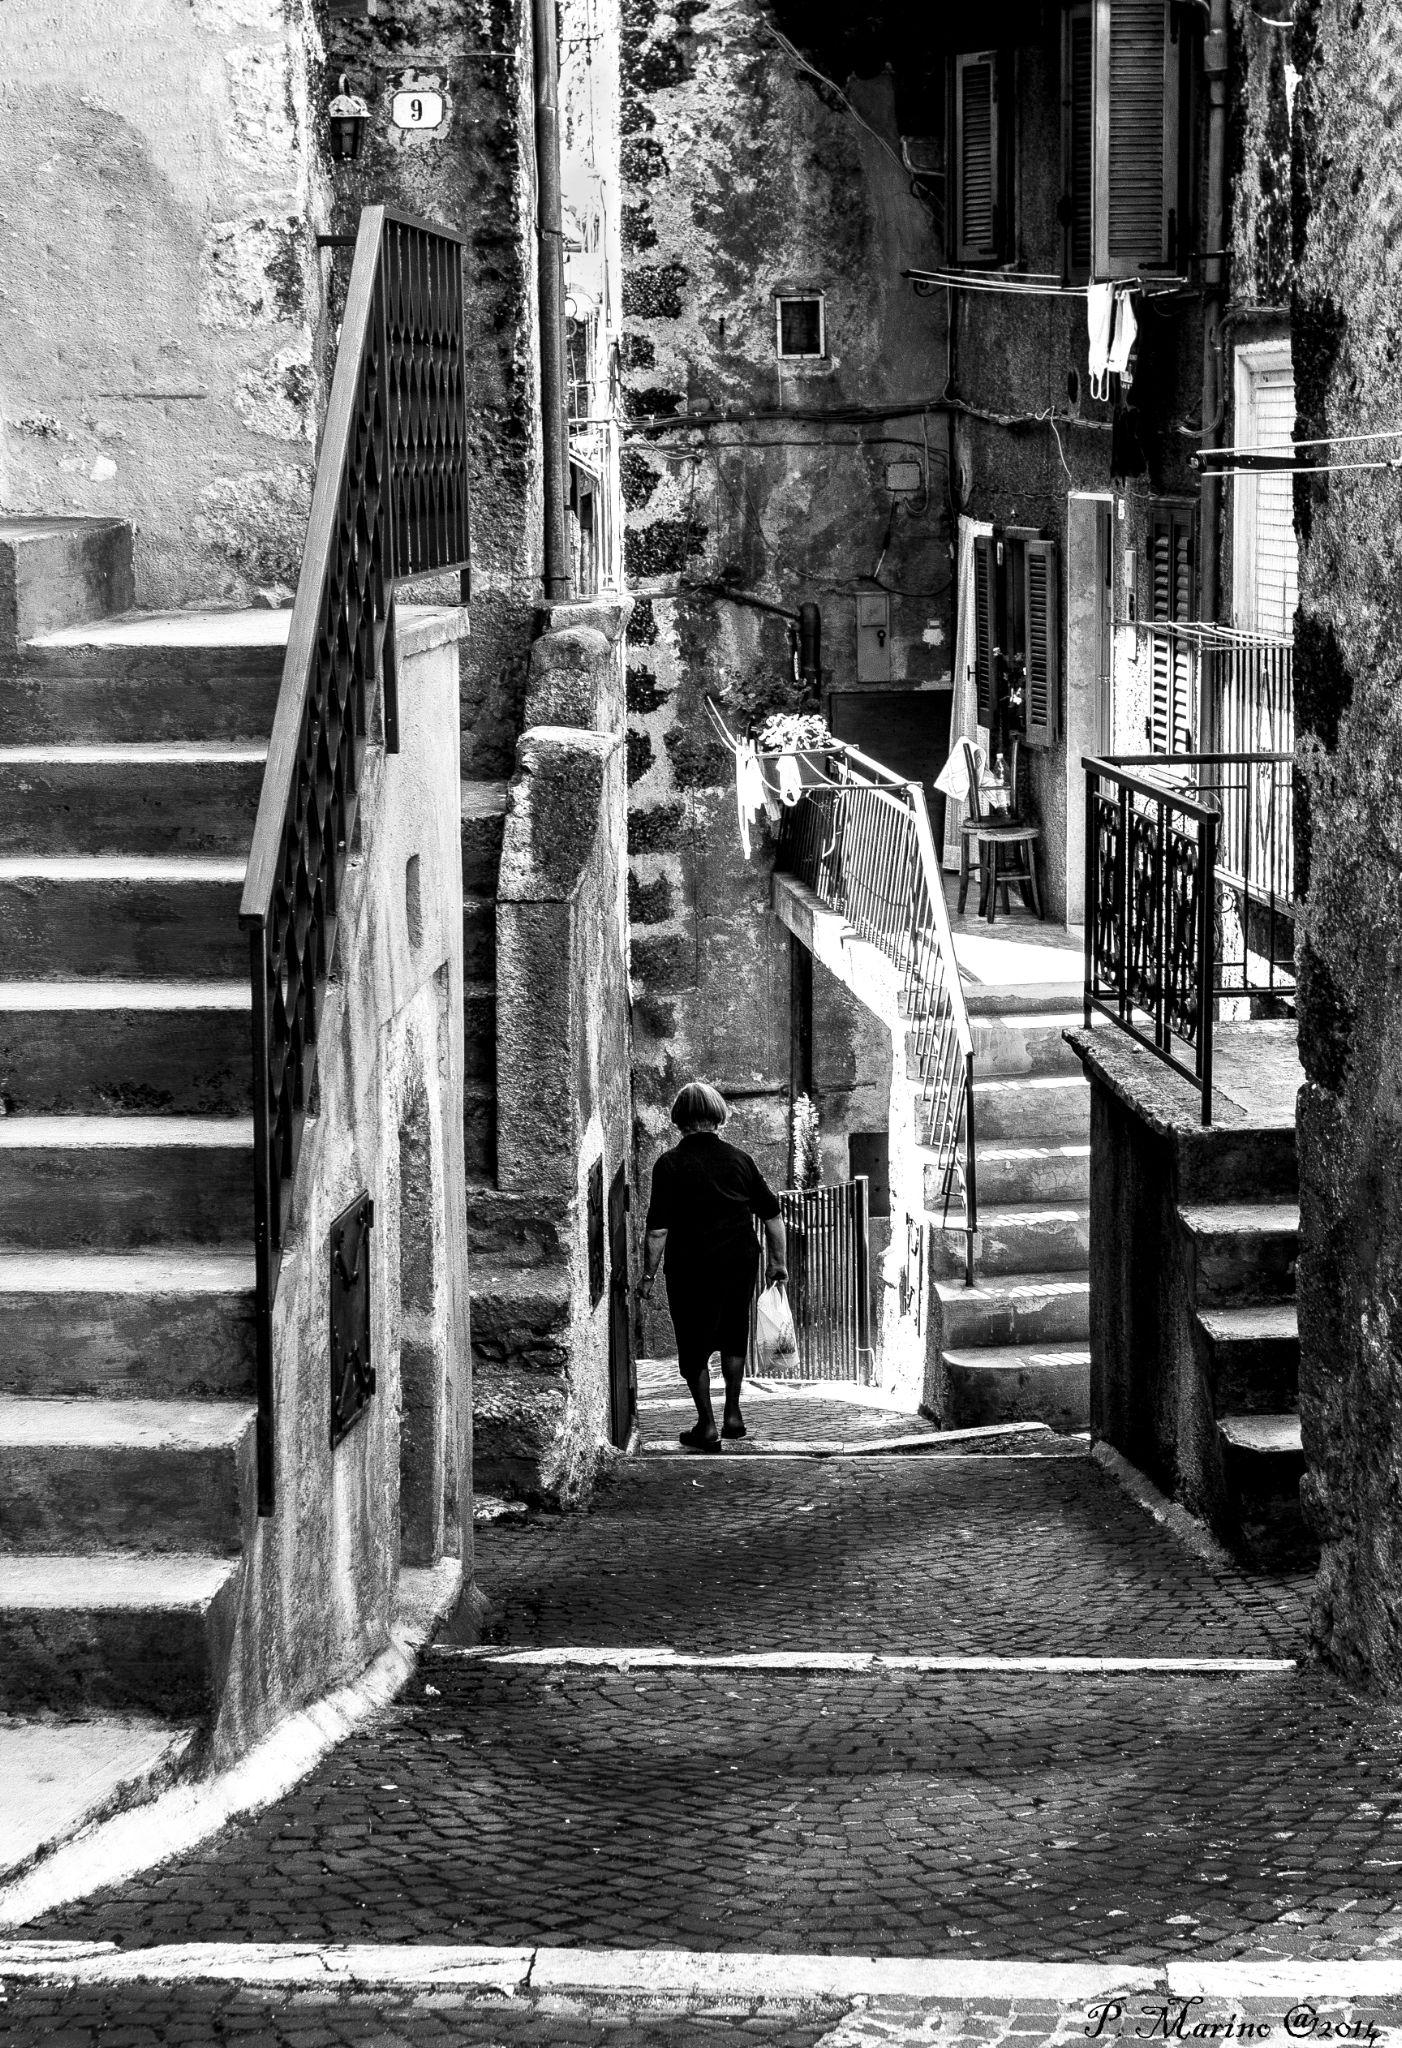 Untitled by Pietro Marino